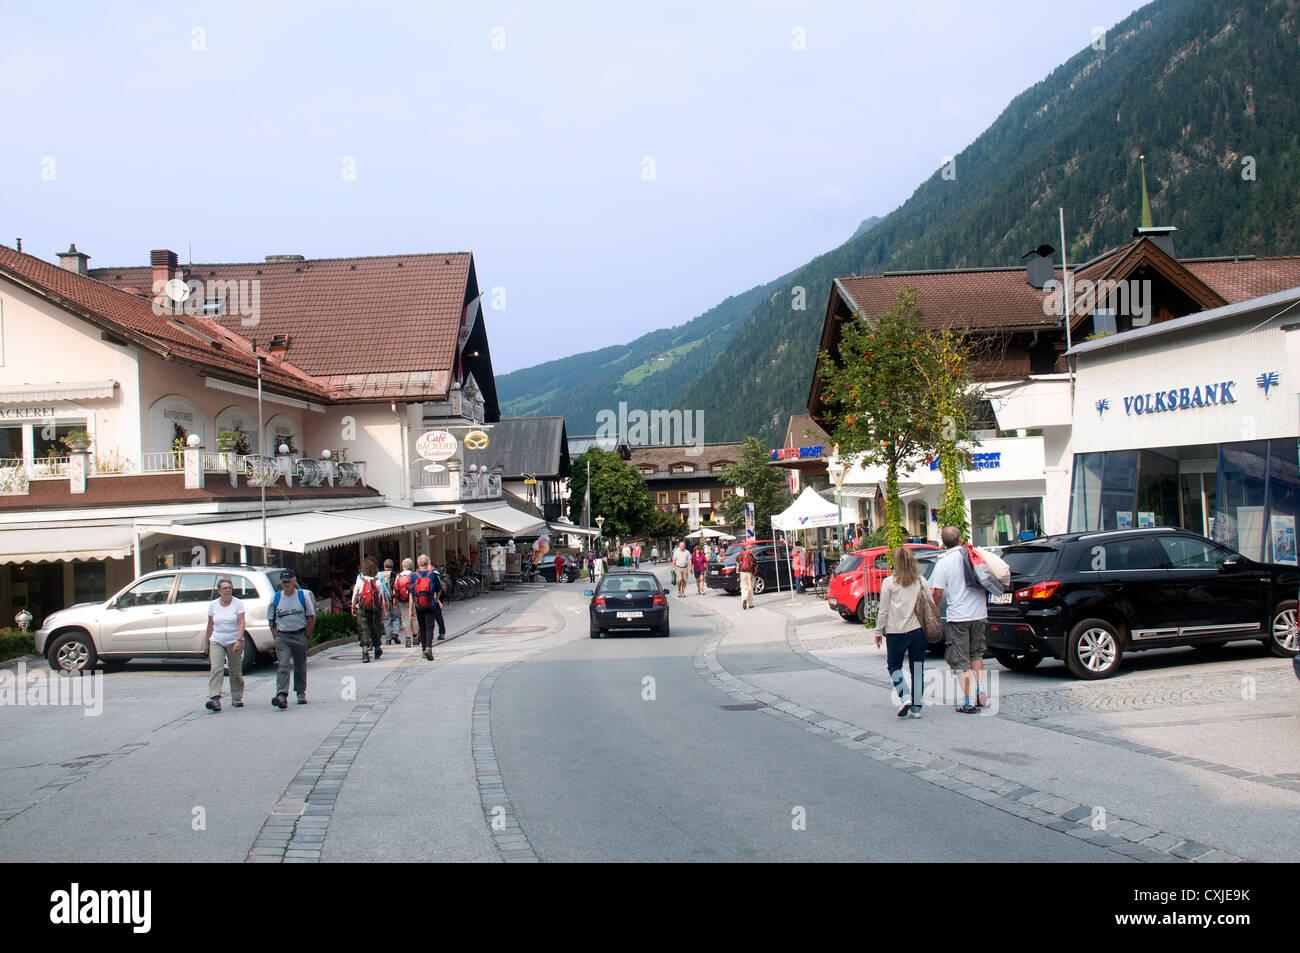 Mayrhofen, Zillertal, Tyrol, Austria - Stock Image